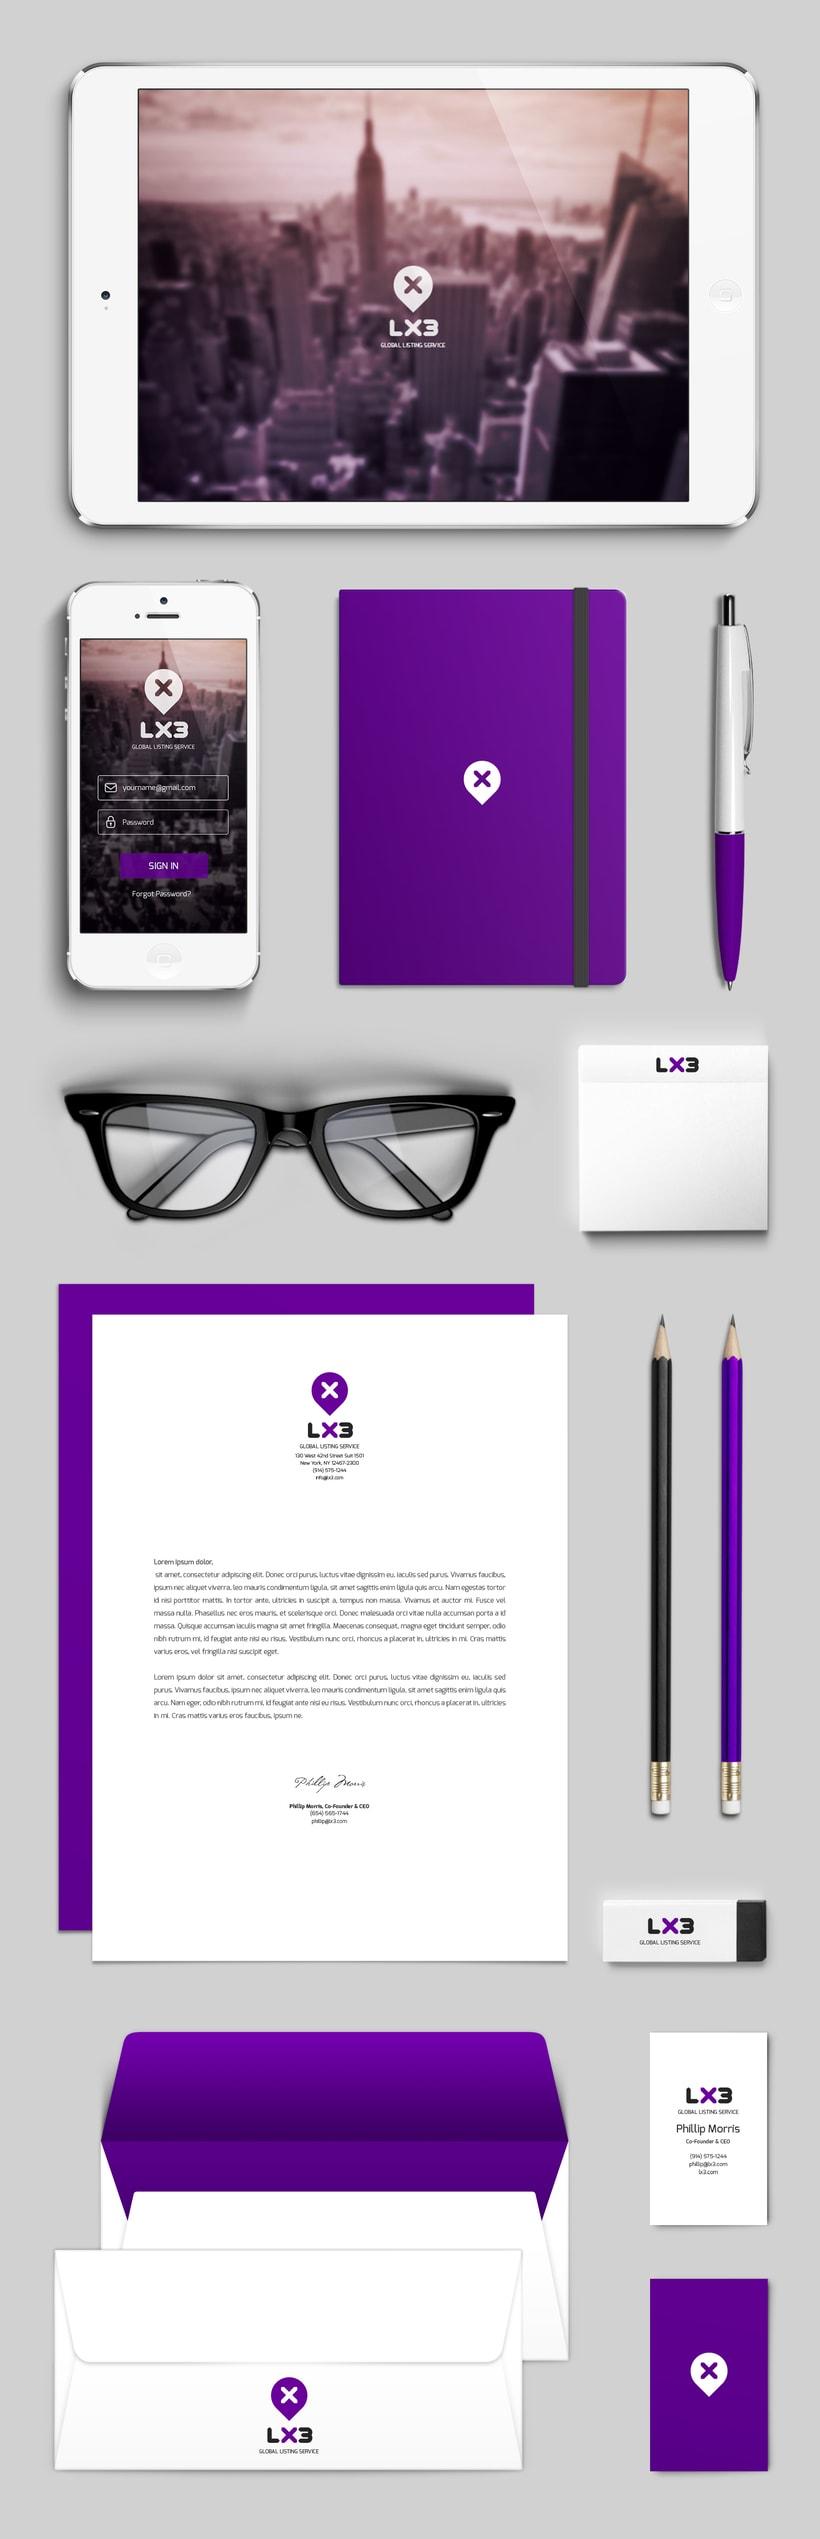 Lx3 | Global listing service 6